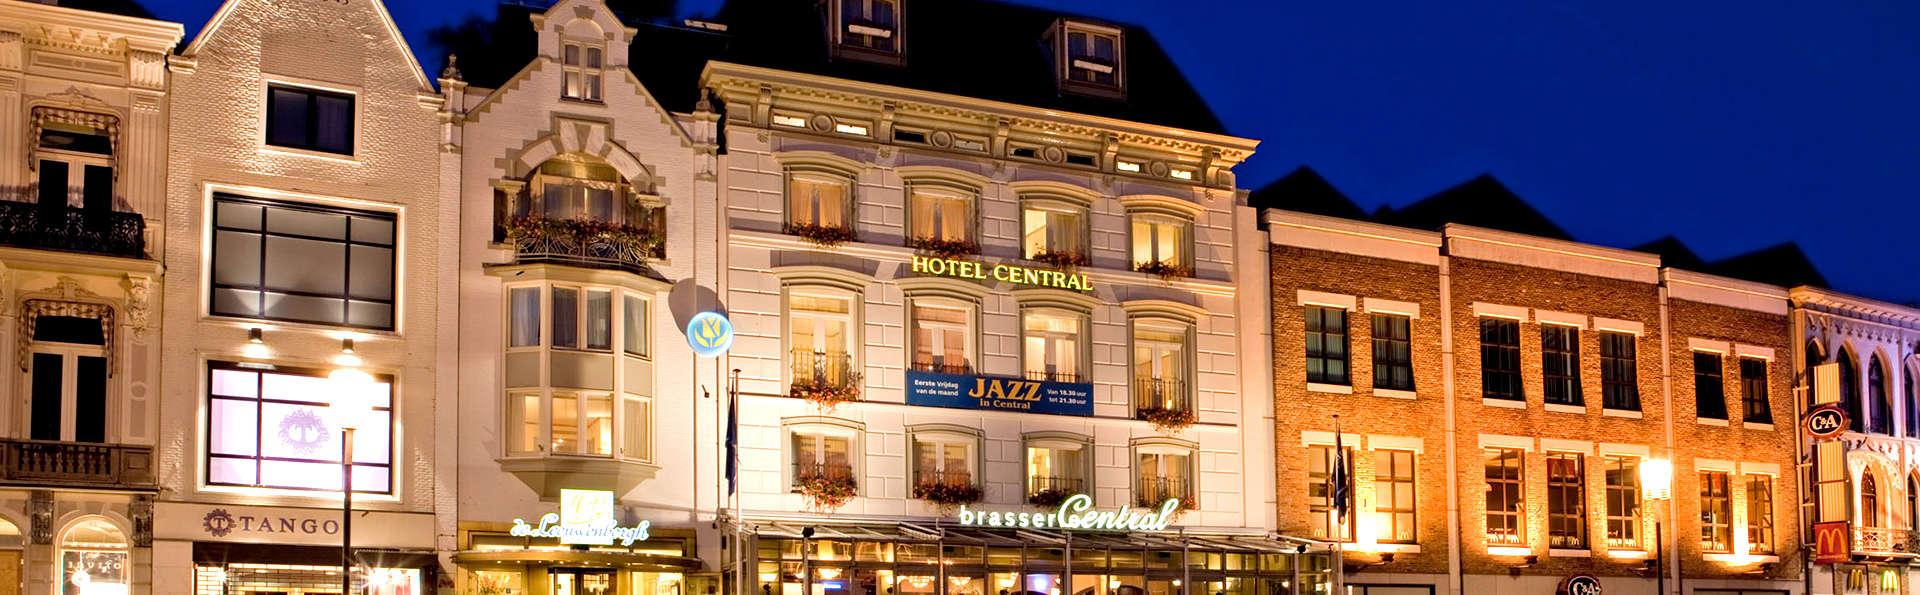 Golden Tulip Hotel Central - EDIT_NEW_FRONT.jpg